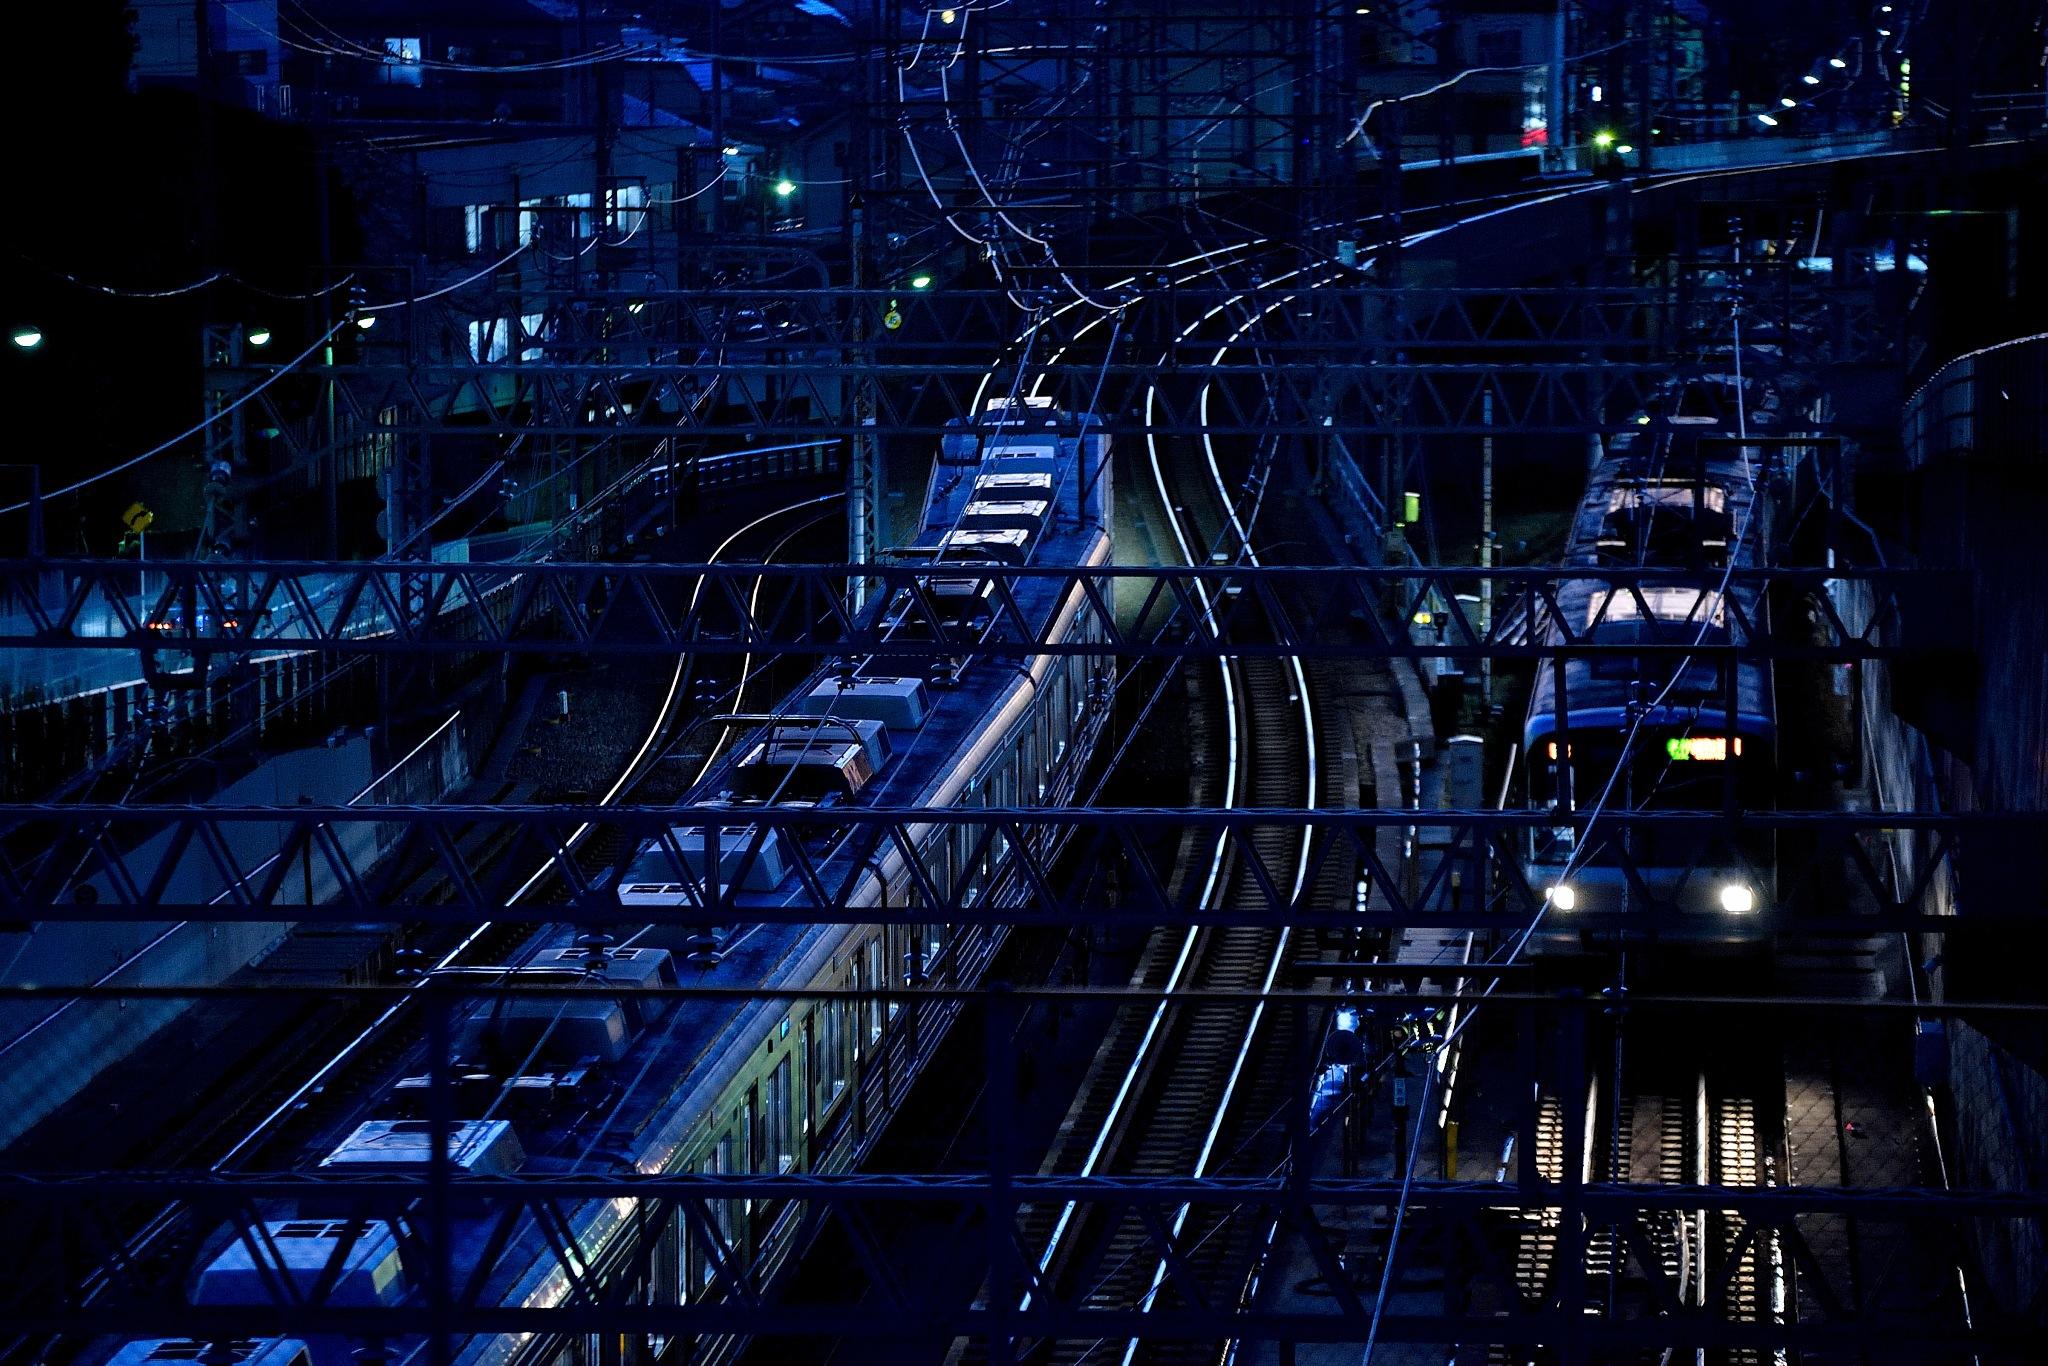 midnight train by Y. Takei